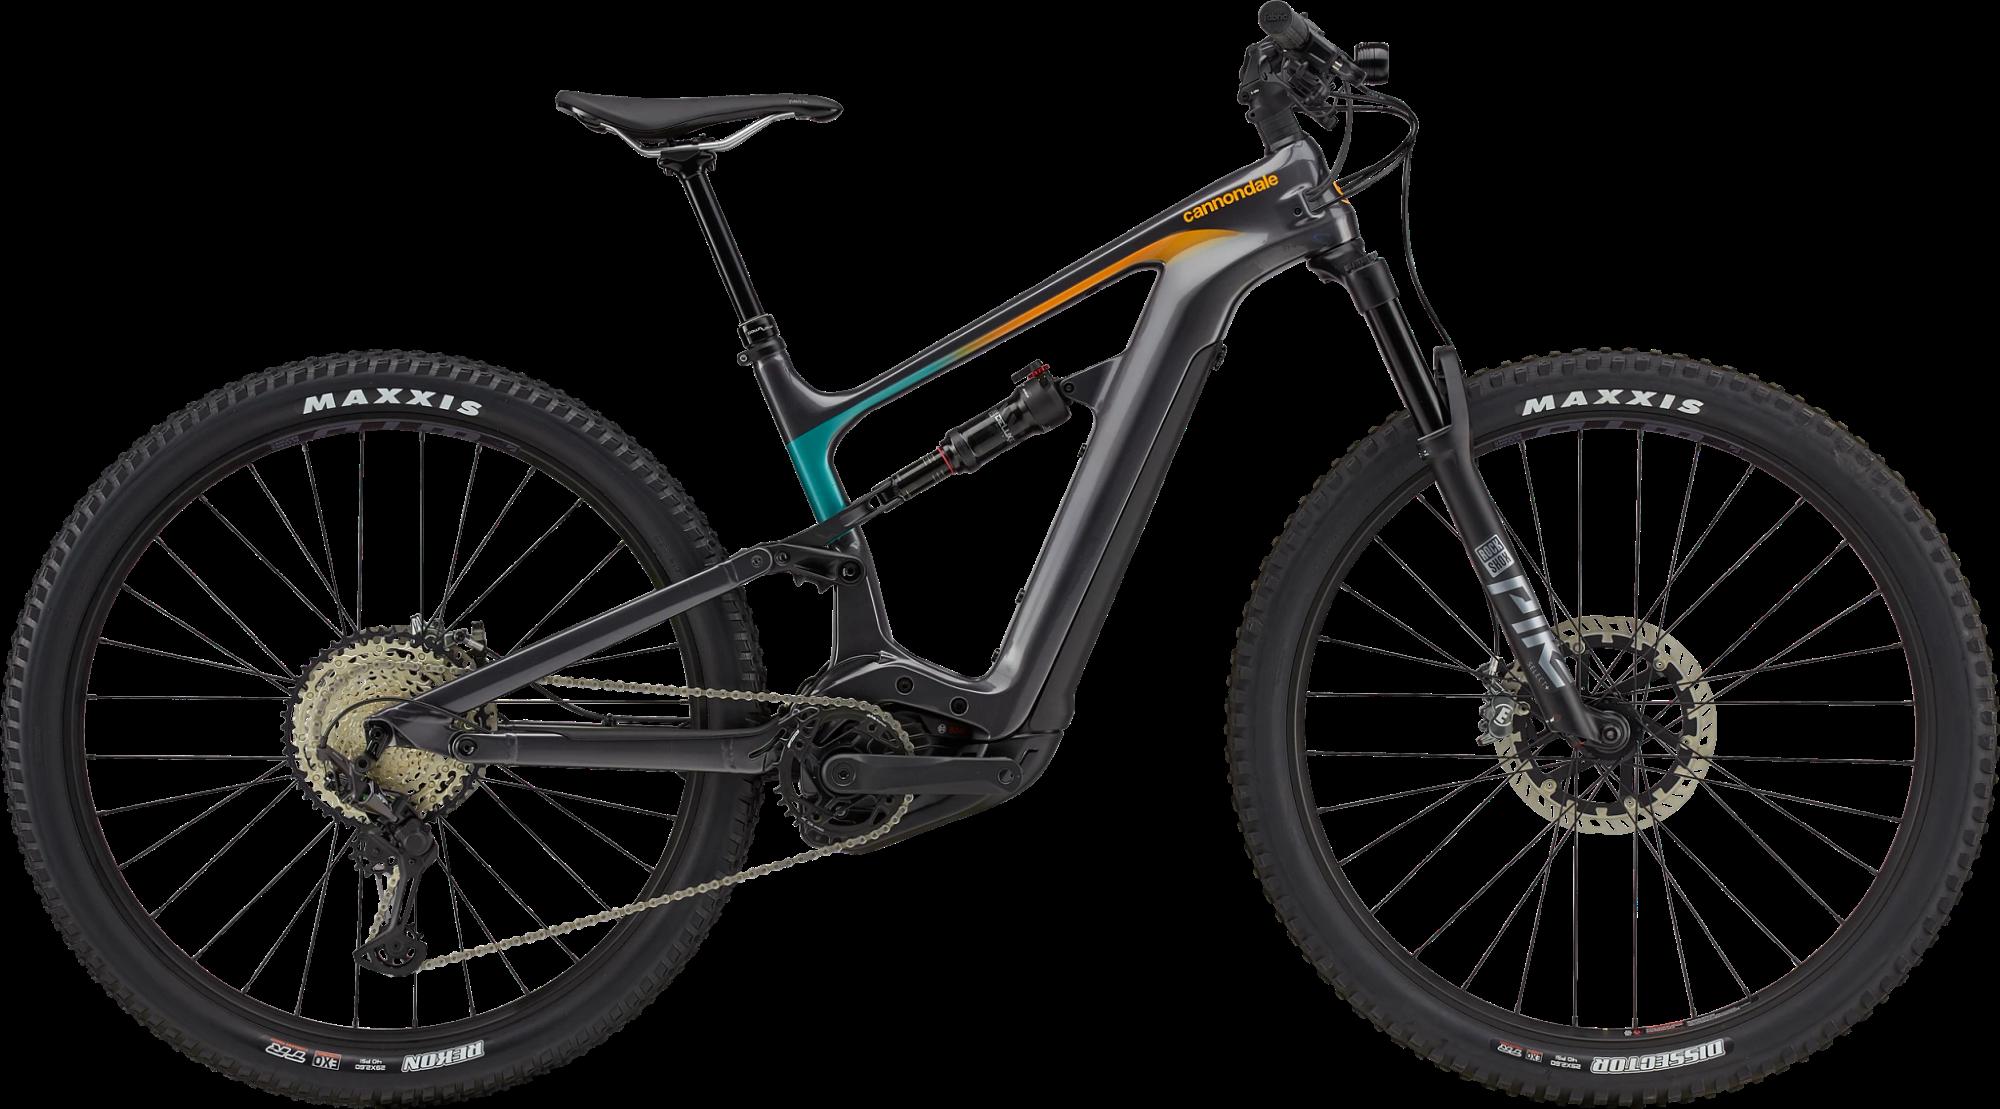 Cannondale Habit Neo 1 XT 12 spd  Electric Mountain Bike 2021 Graphite